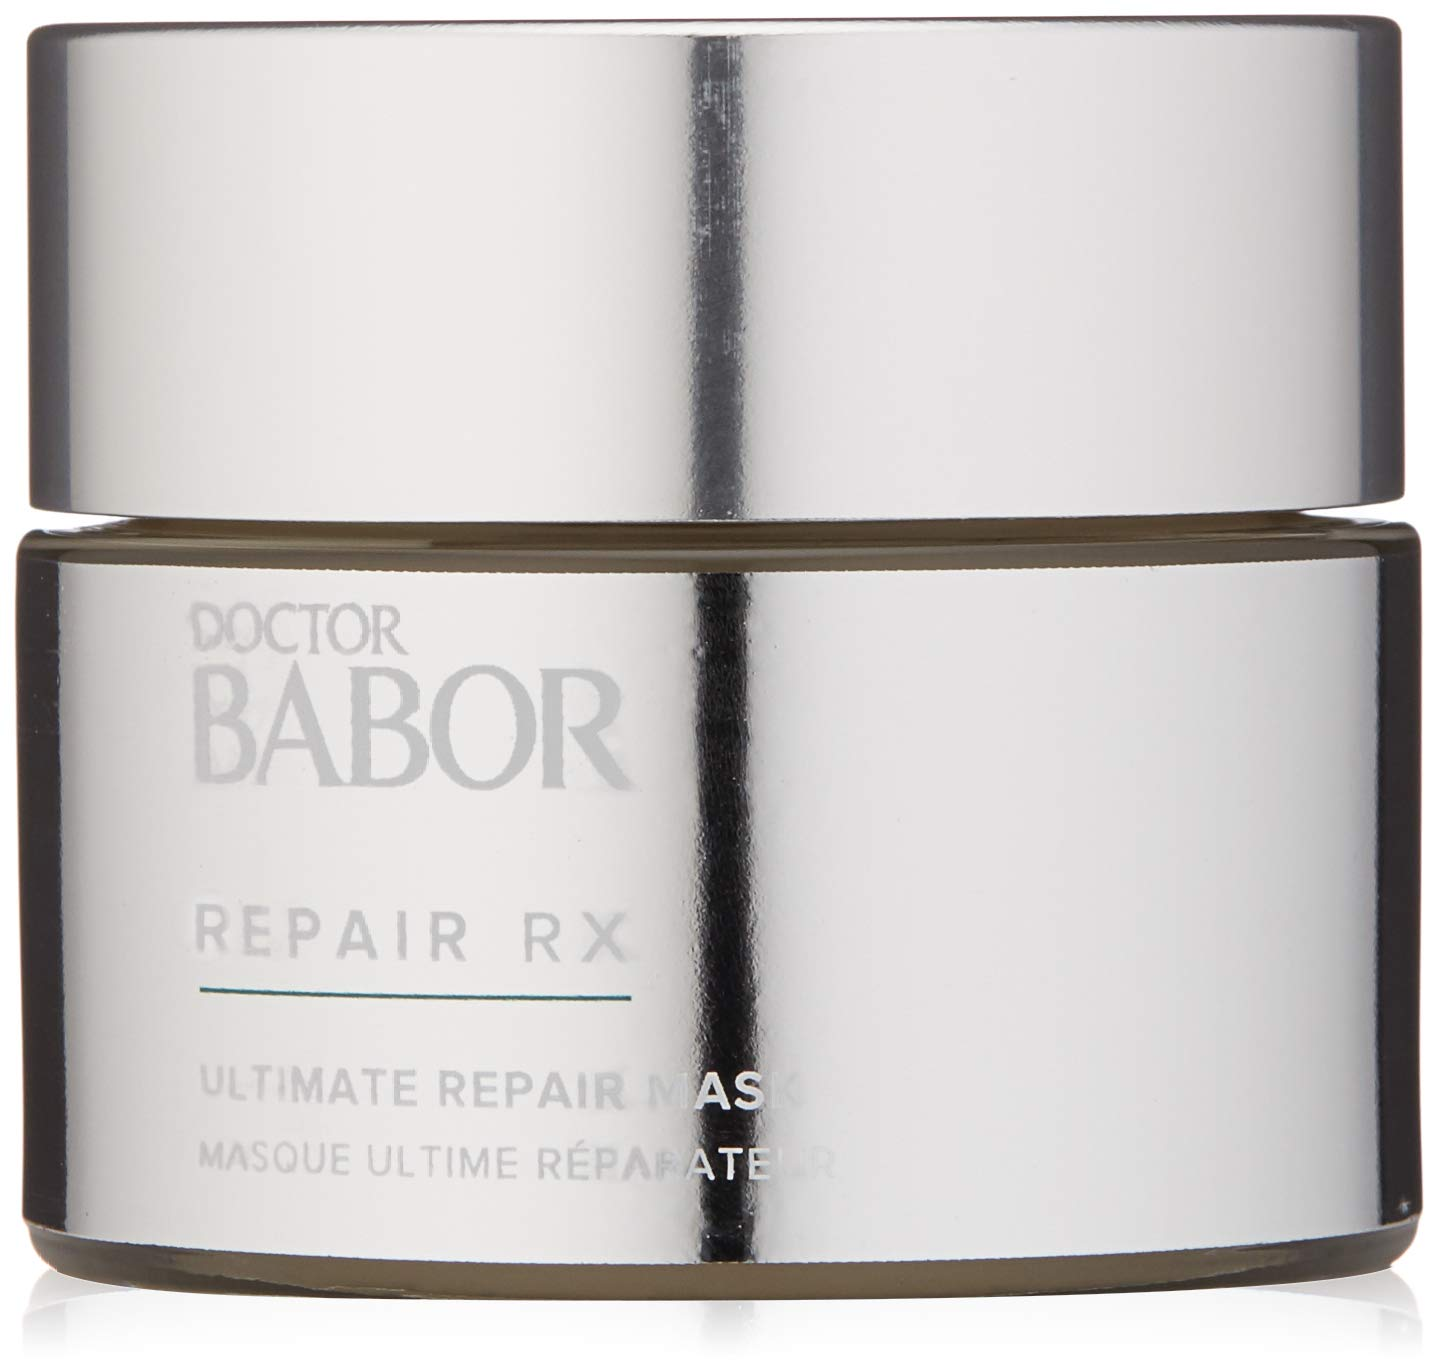 Babor Doctor Cellular Ultimate Repair Mask 464330